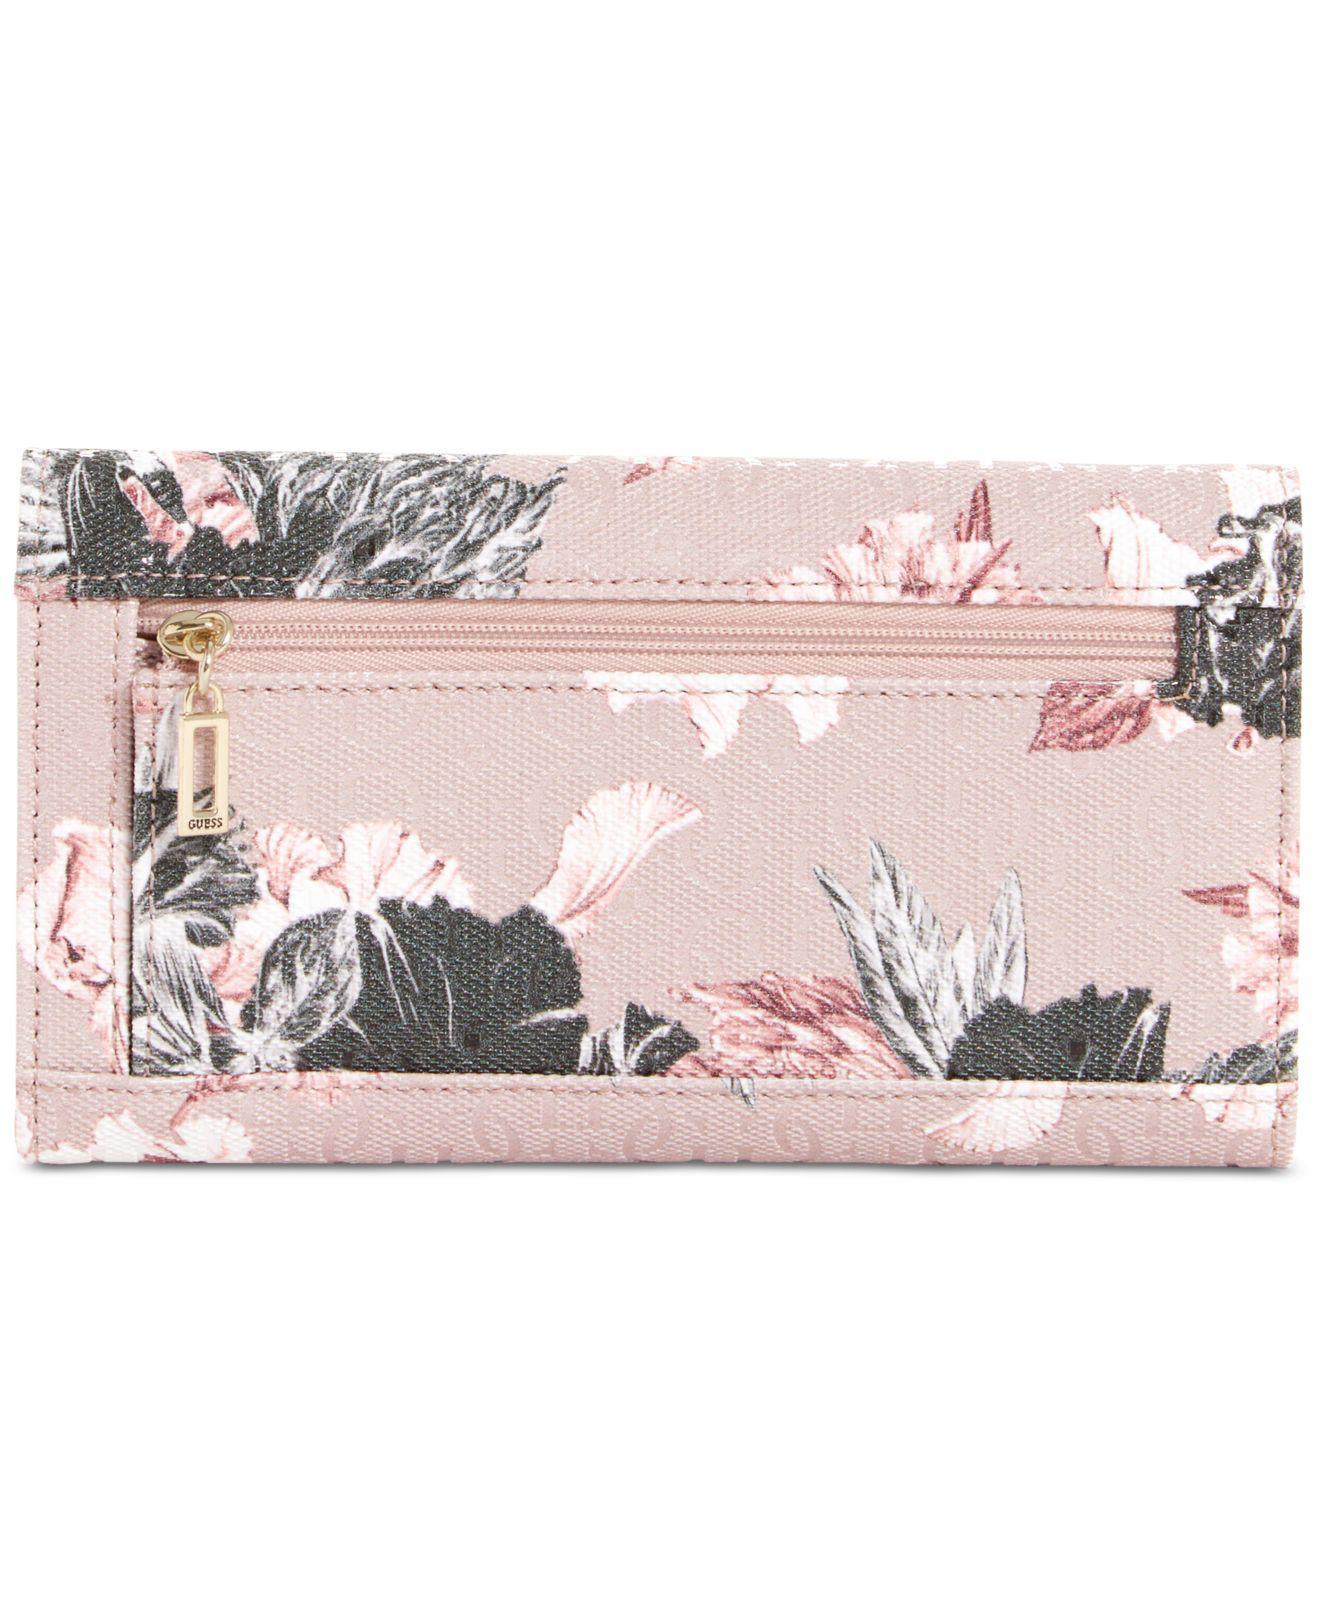 In Slim Clutch Lyst Guess Wallet Pink Halley ZAAnXH 7088a7ecf759a